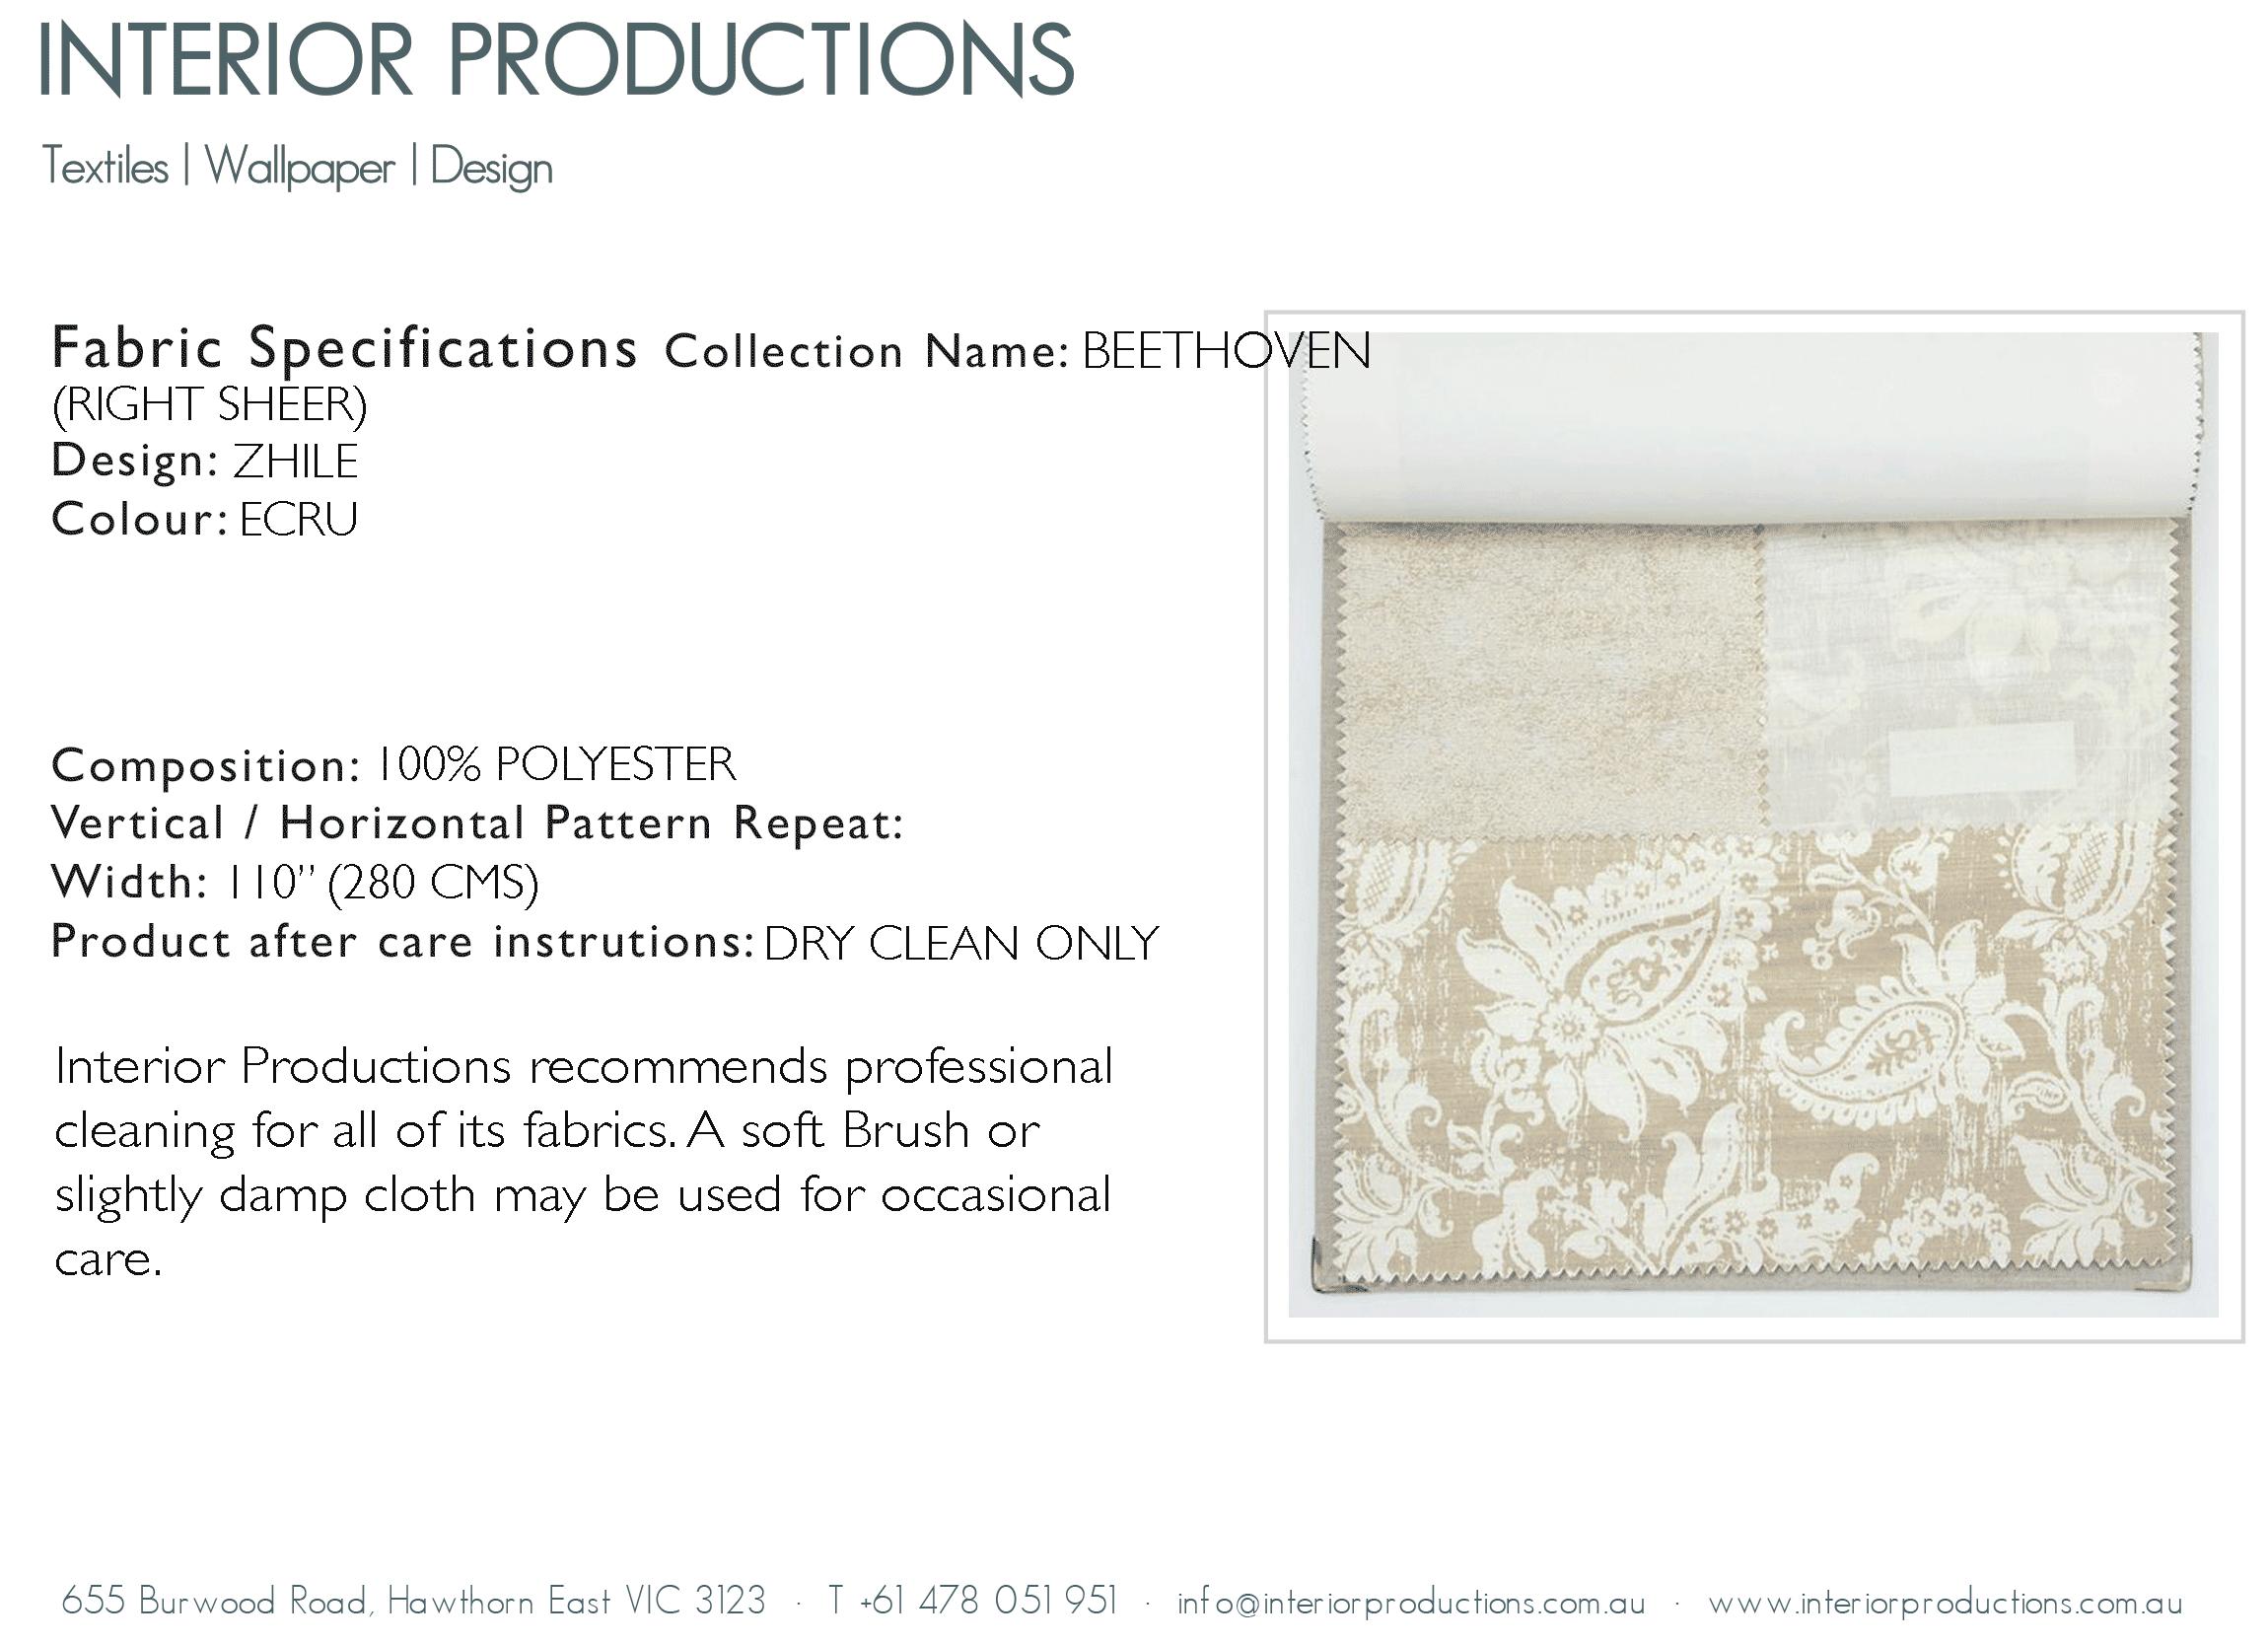 interior_productions_ZHILE---ECRU